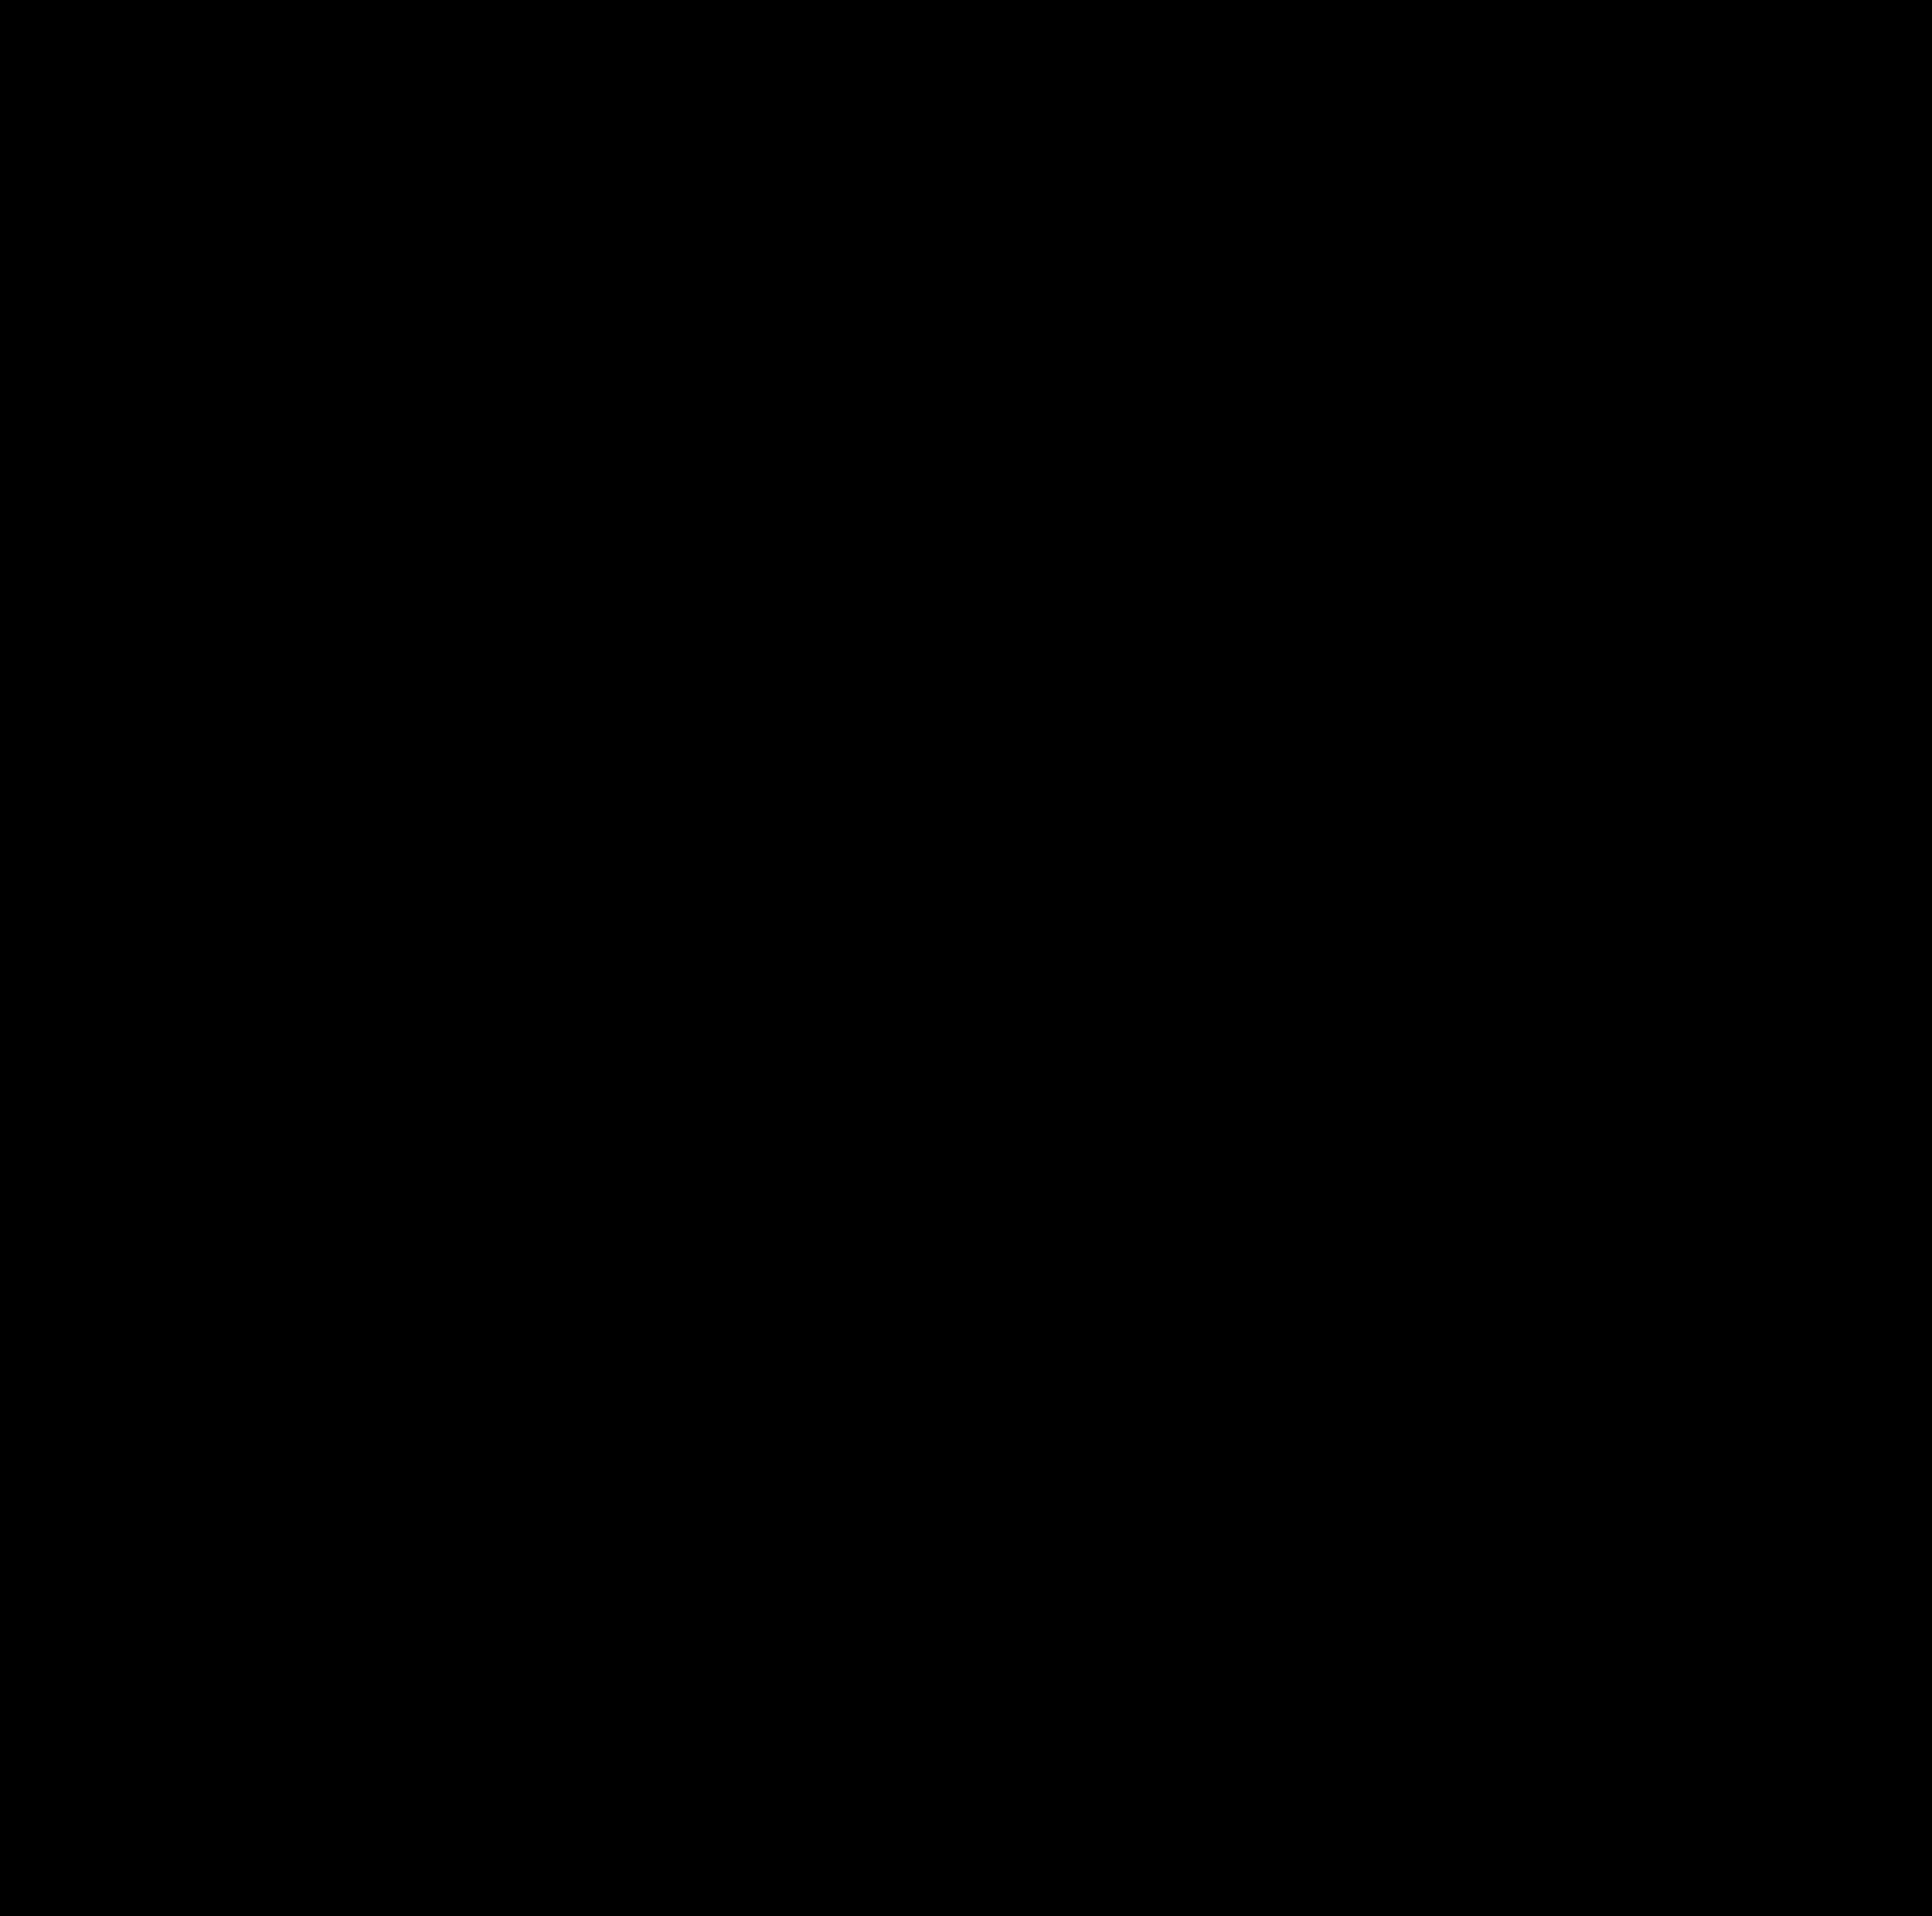 File silhouette svg wikimedia. Ox clipart zebu